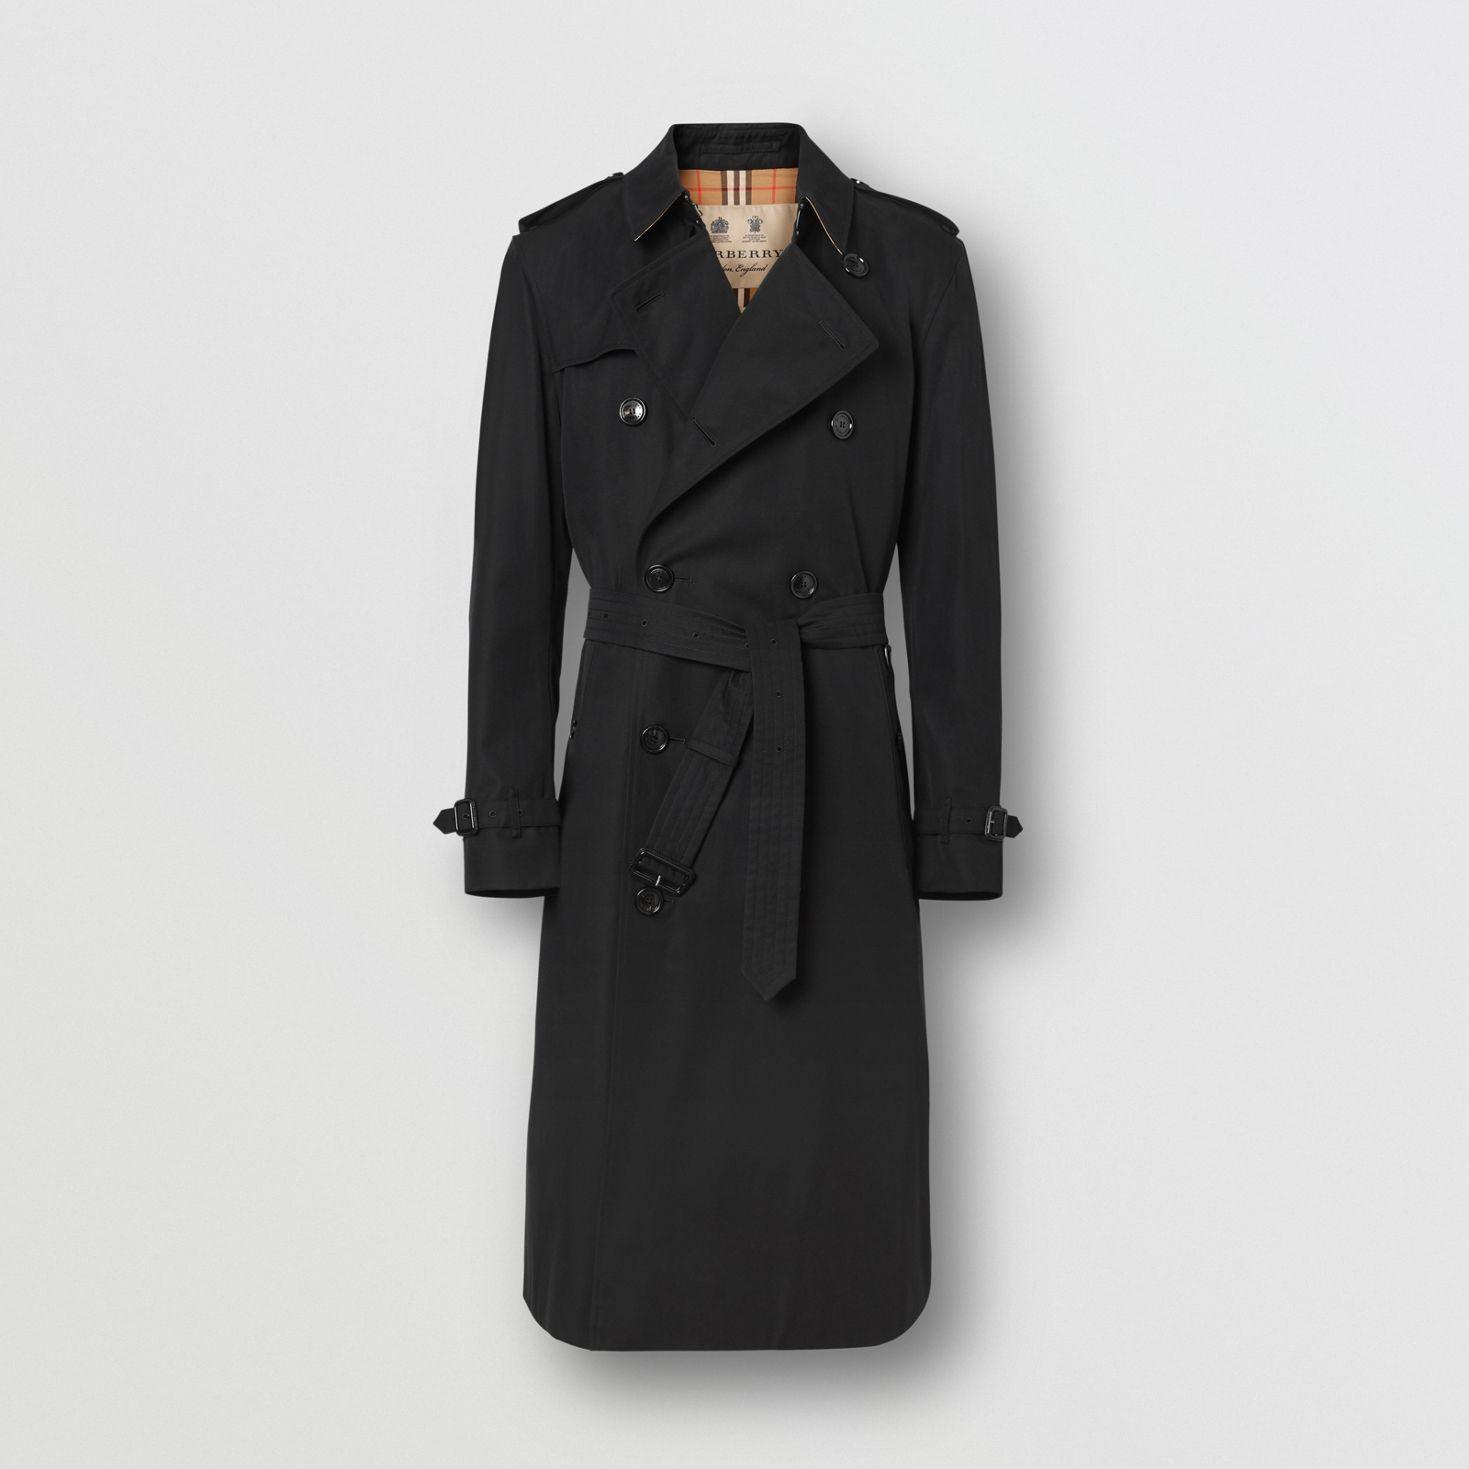 The Kensington - Trench coat Heritage longo_men.jpg